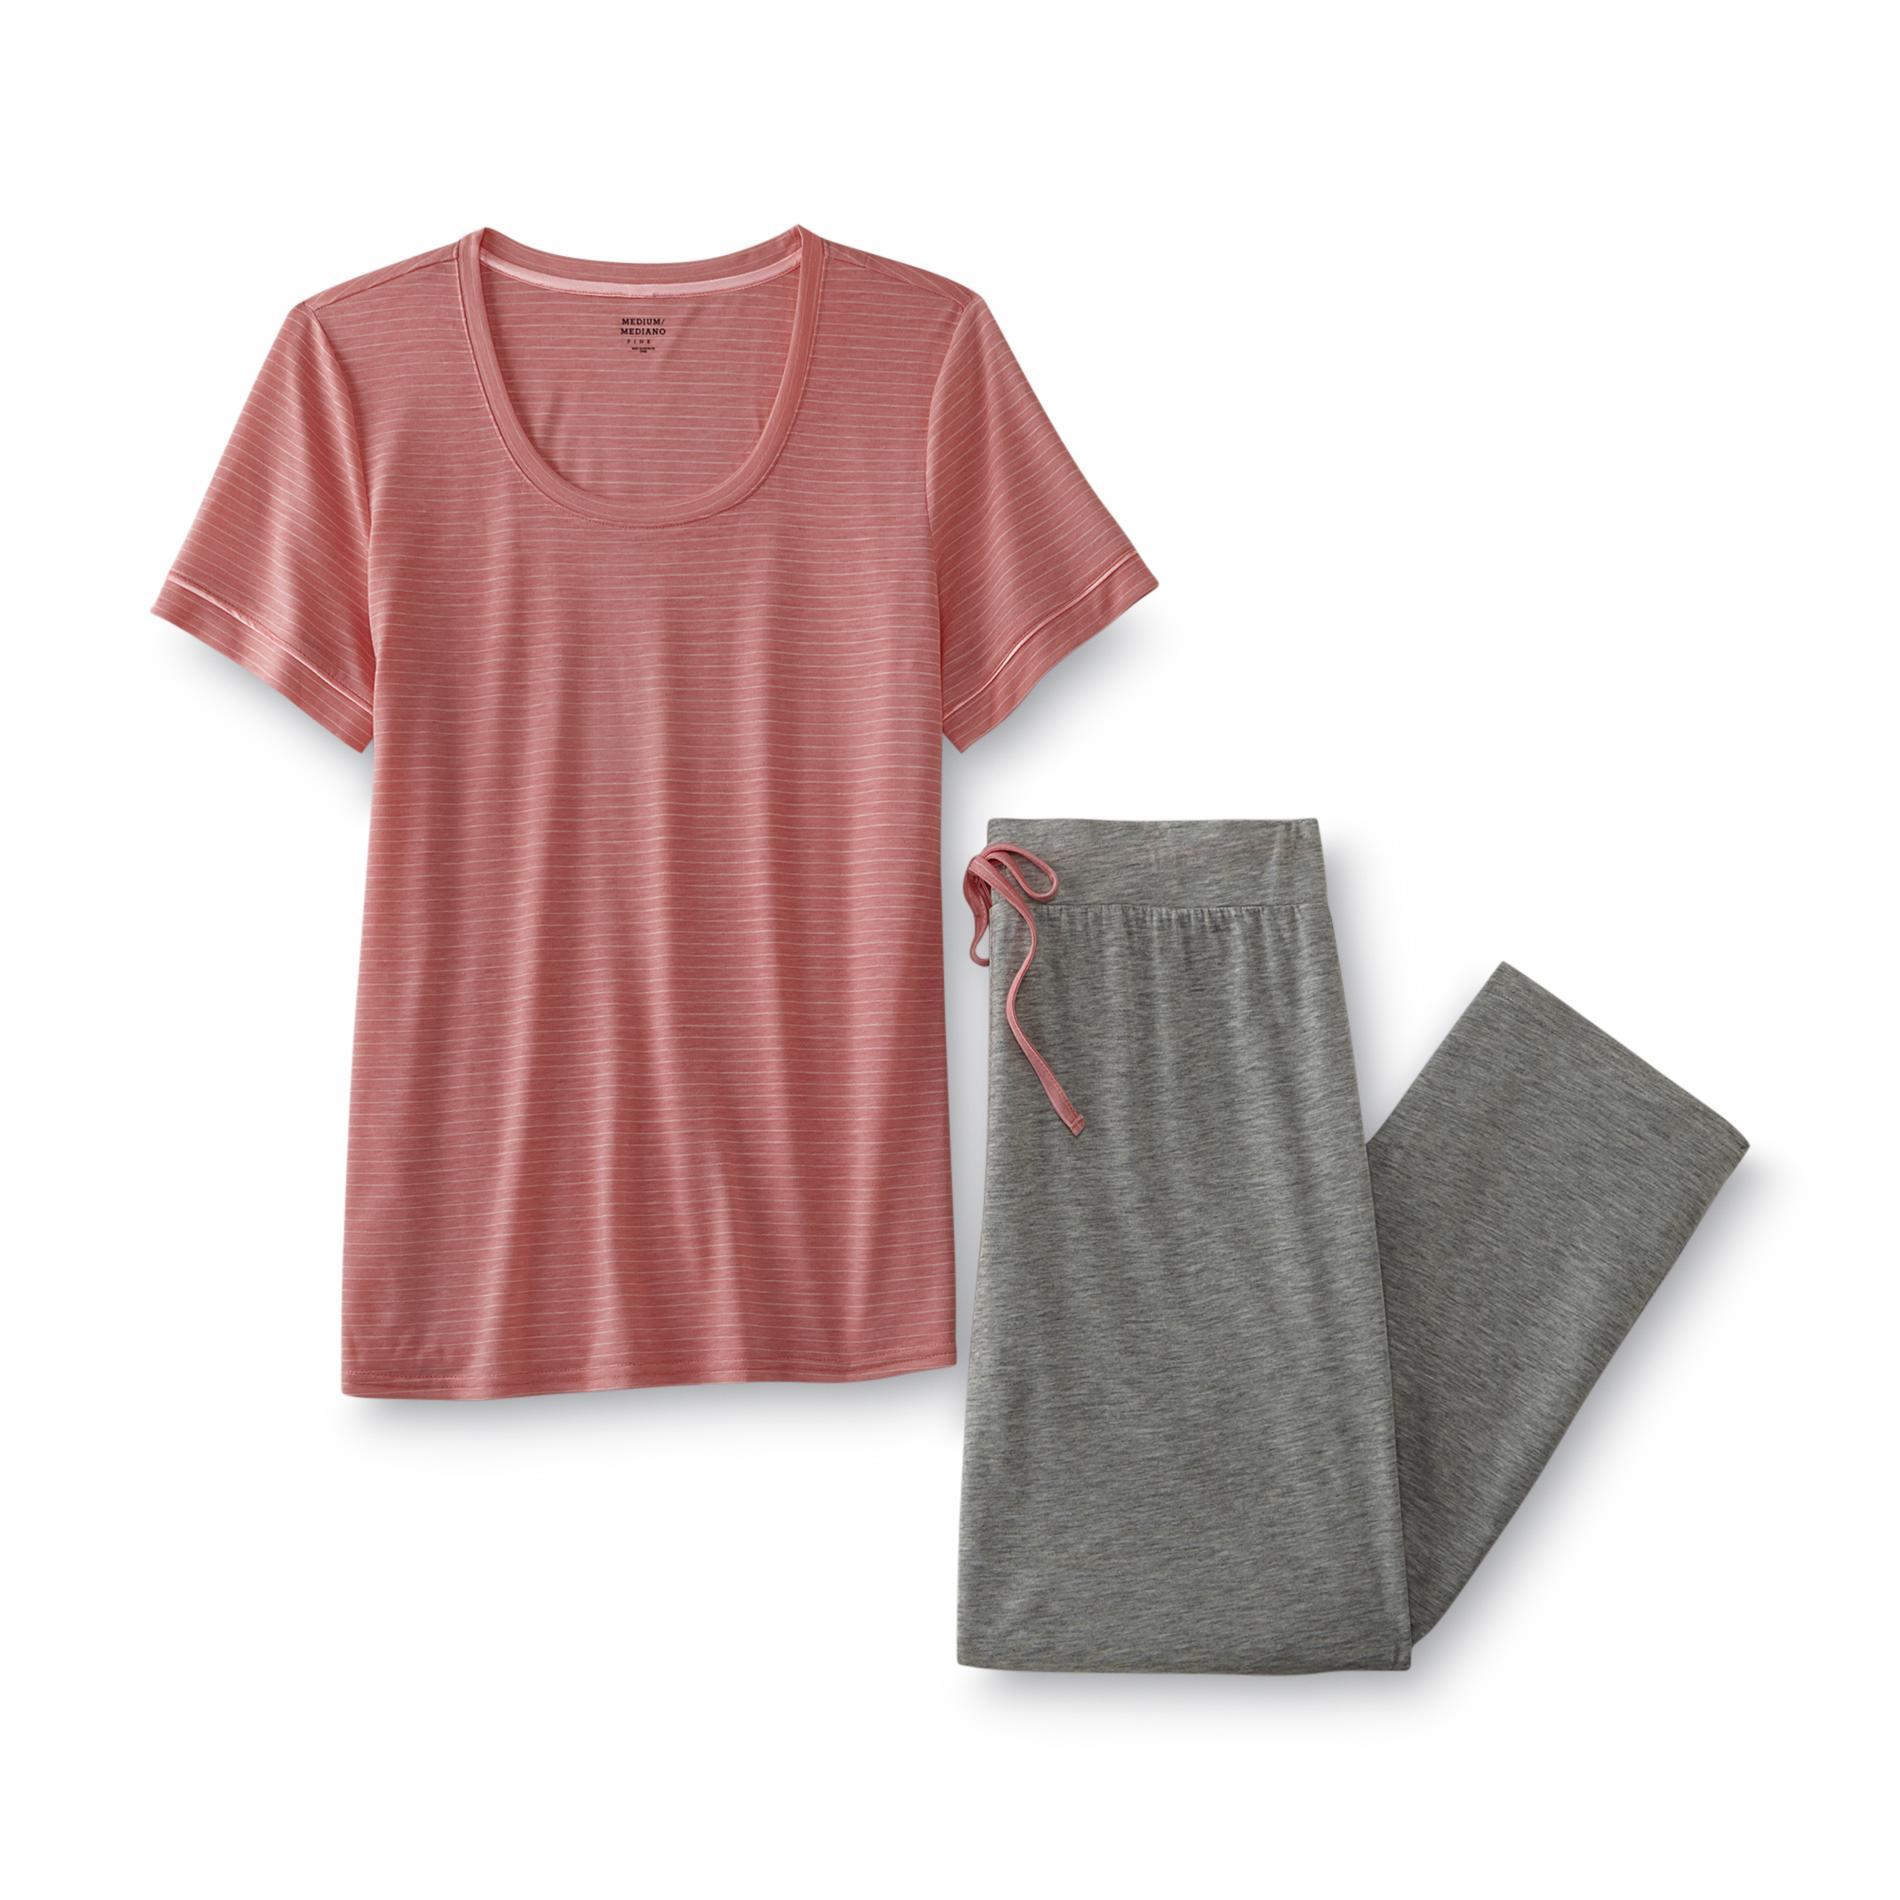 Kmart Jaclyn Smith Pajamas